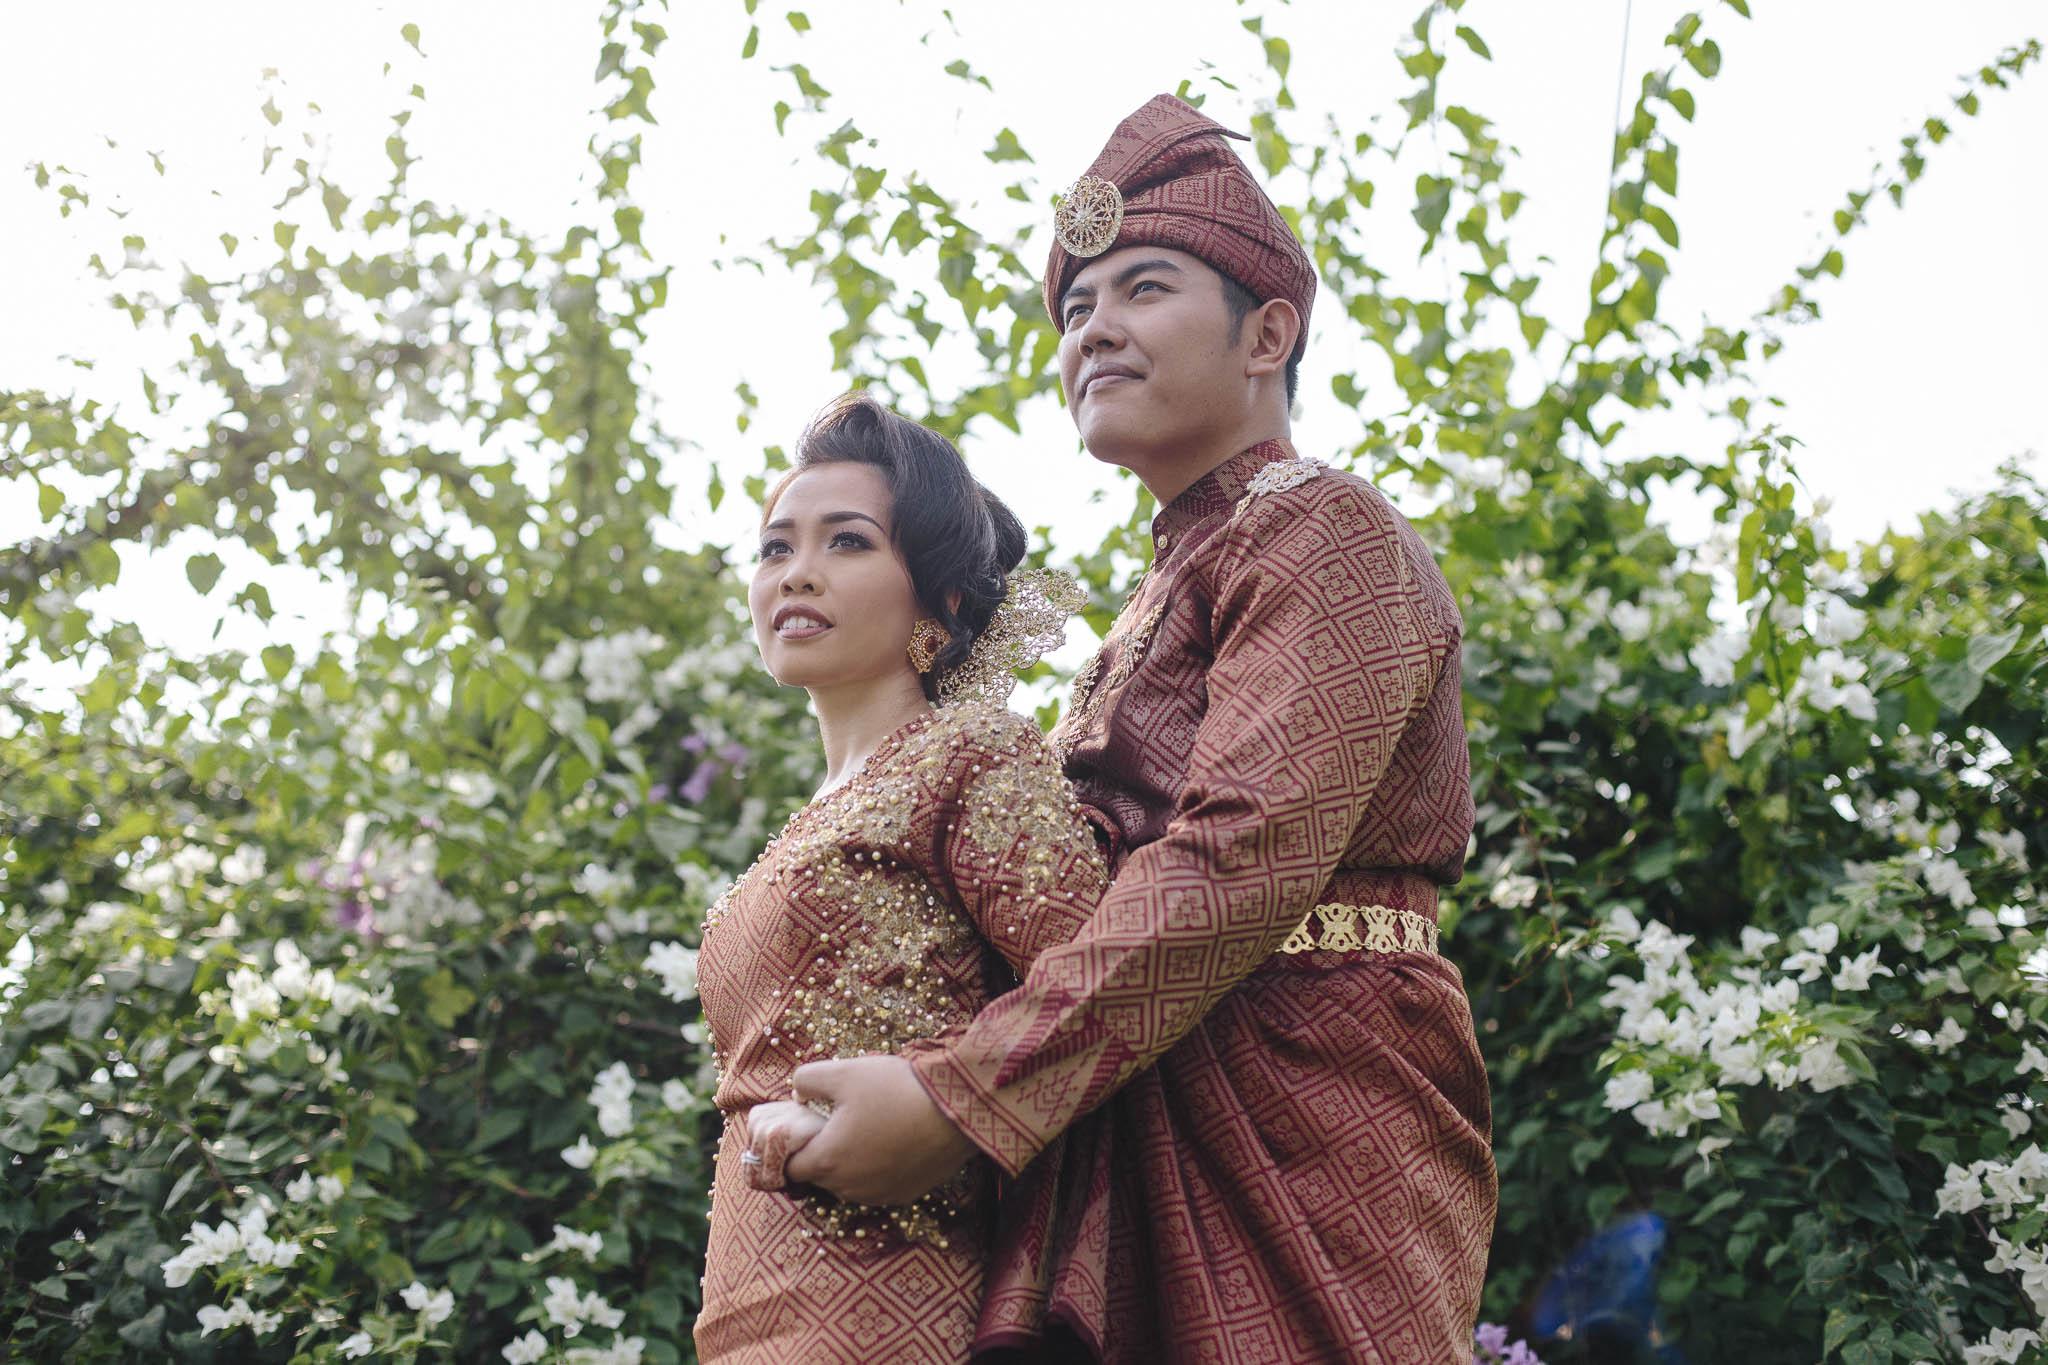 singapore-wedding-photographer-travel-khairul-atikah-56.jpg